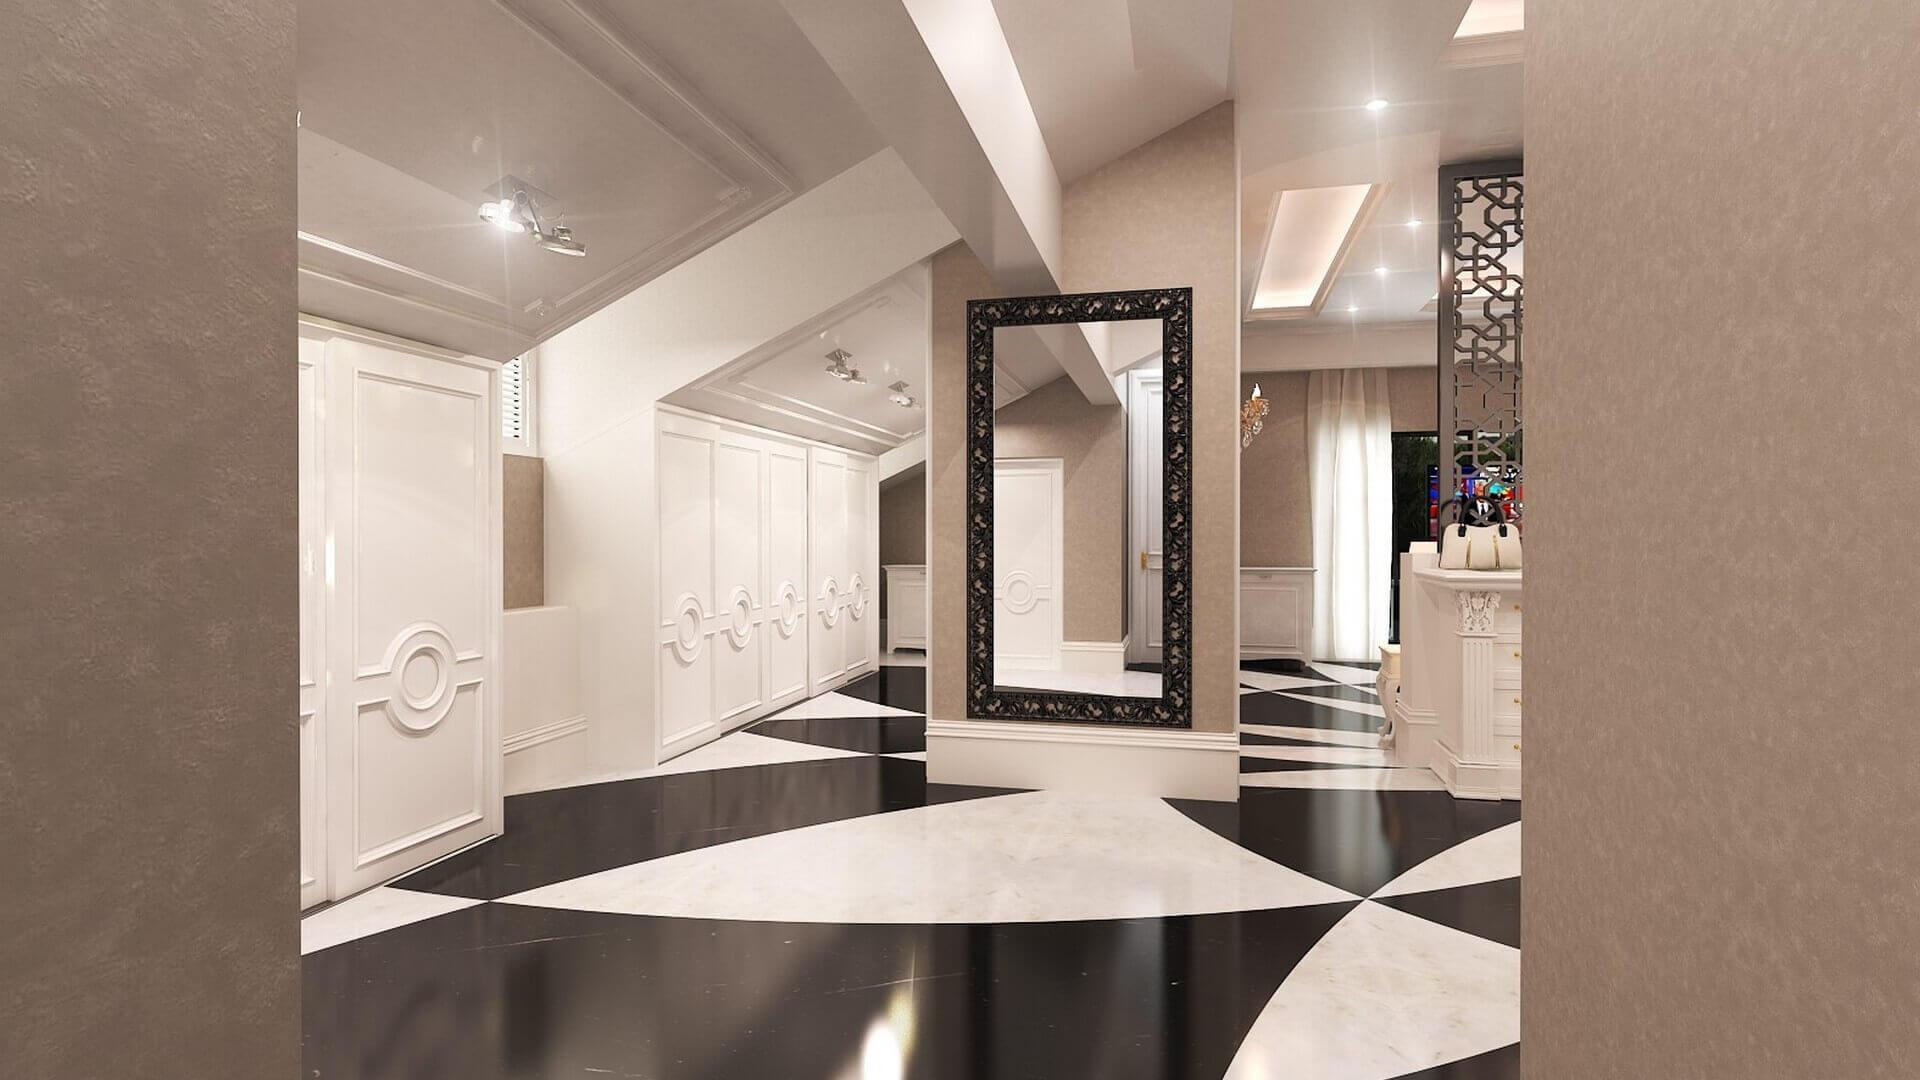 Vantage umitkoy interior designer 2771 Private Project Residential